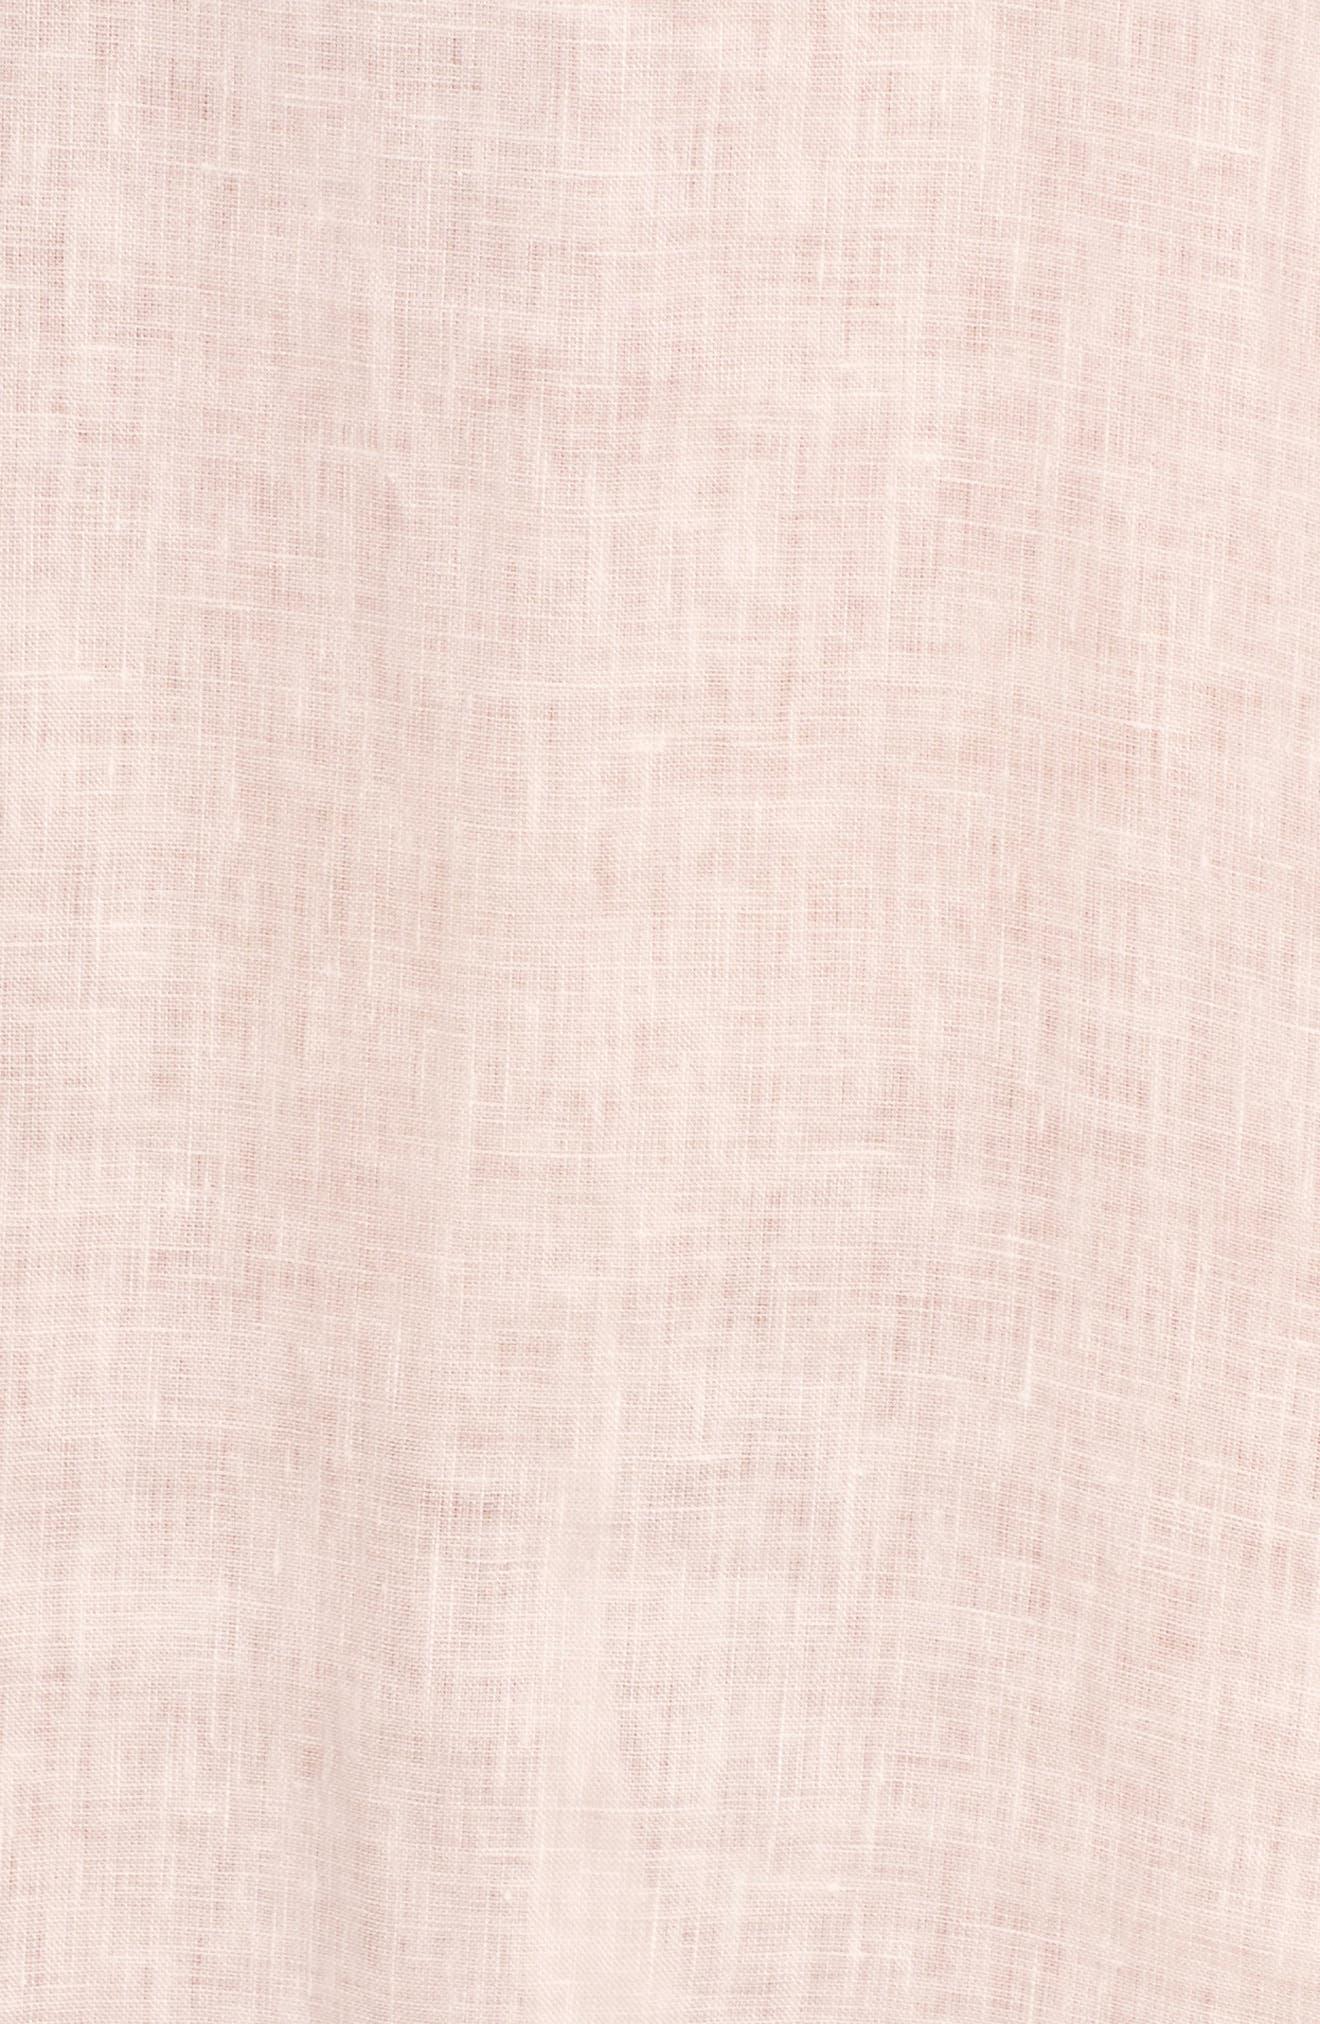 Rata Linen Shift Dress,                             Alternate thumbnail 7, color,                             680